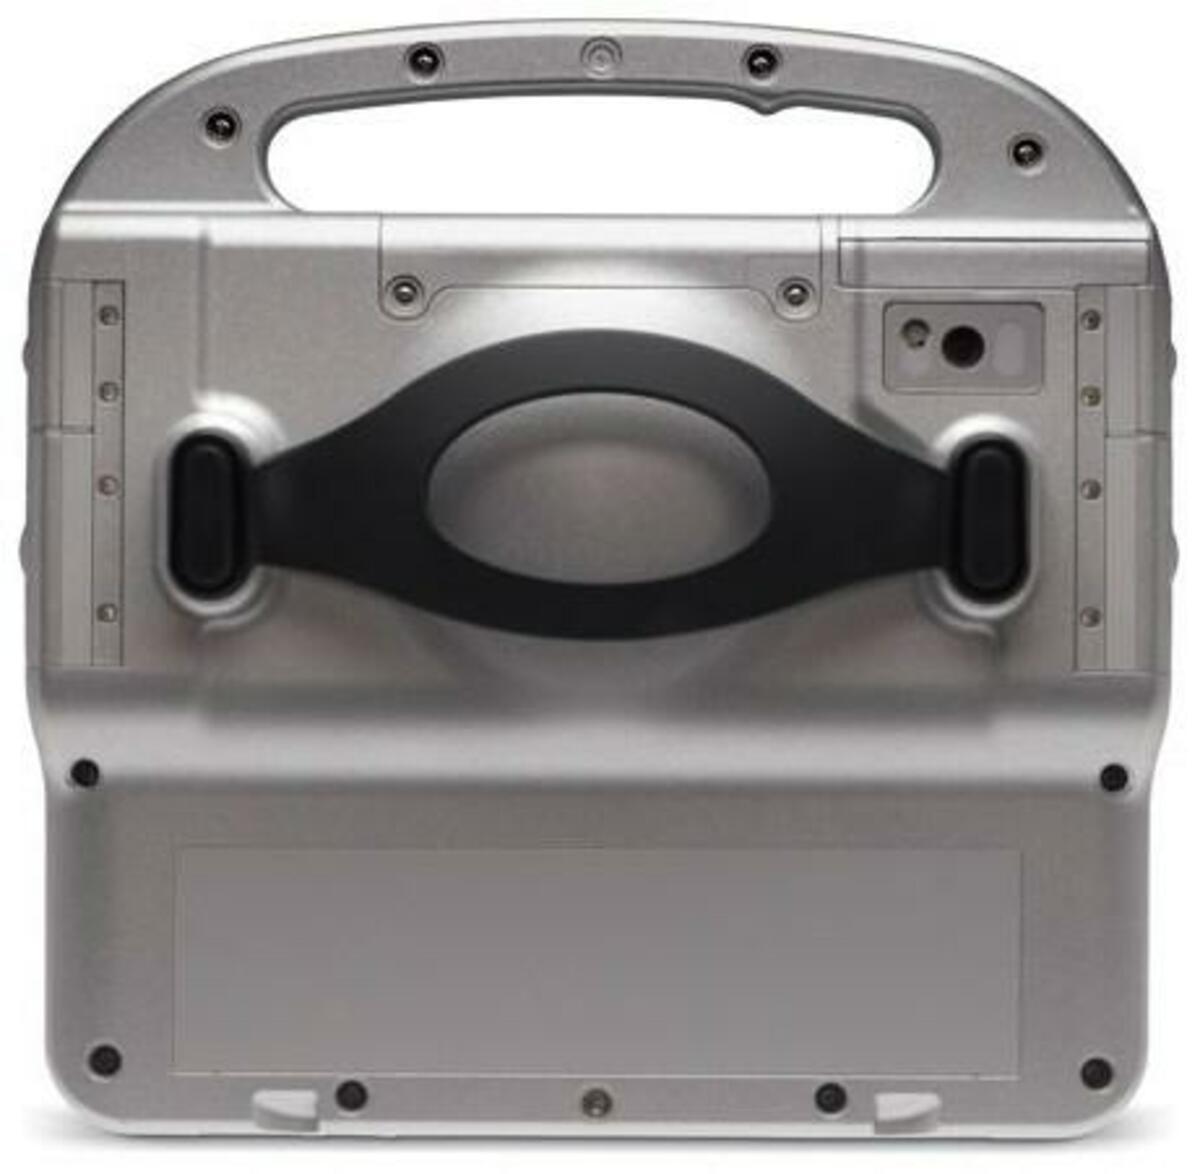 Panasonic Toughbook H2 A 1